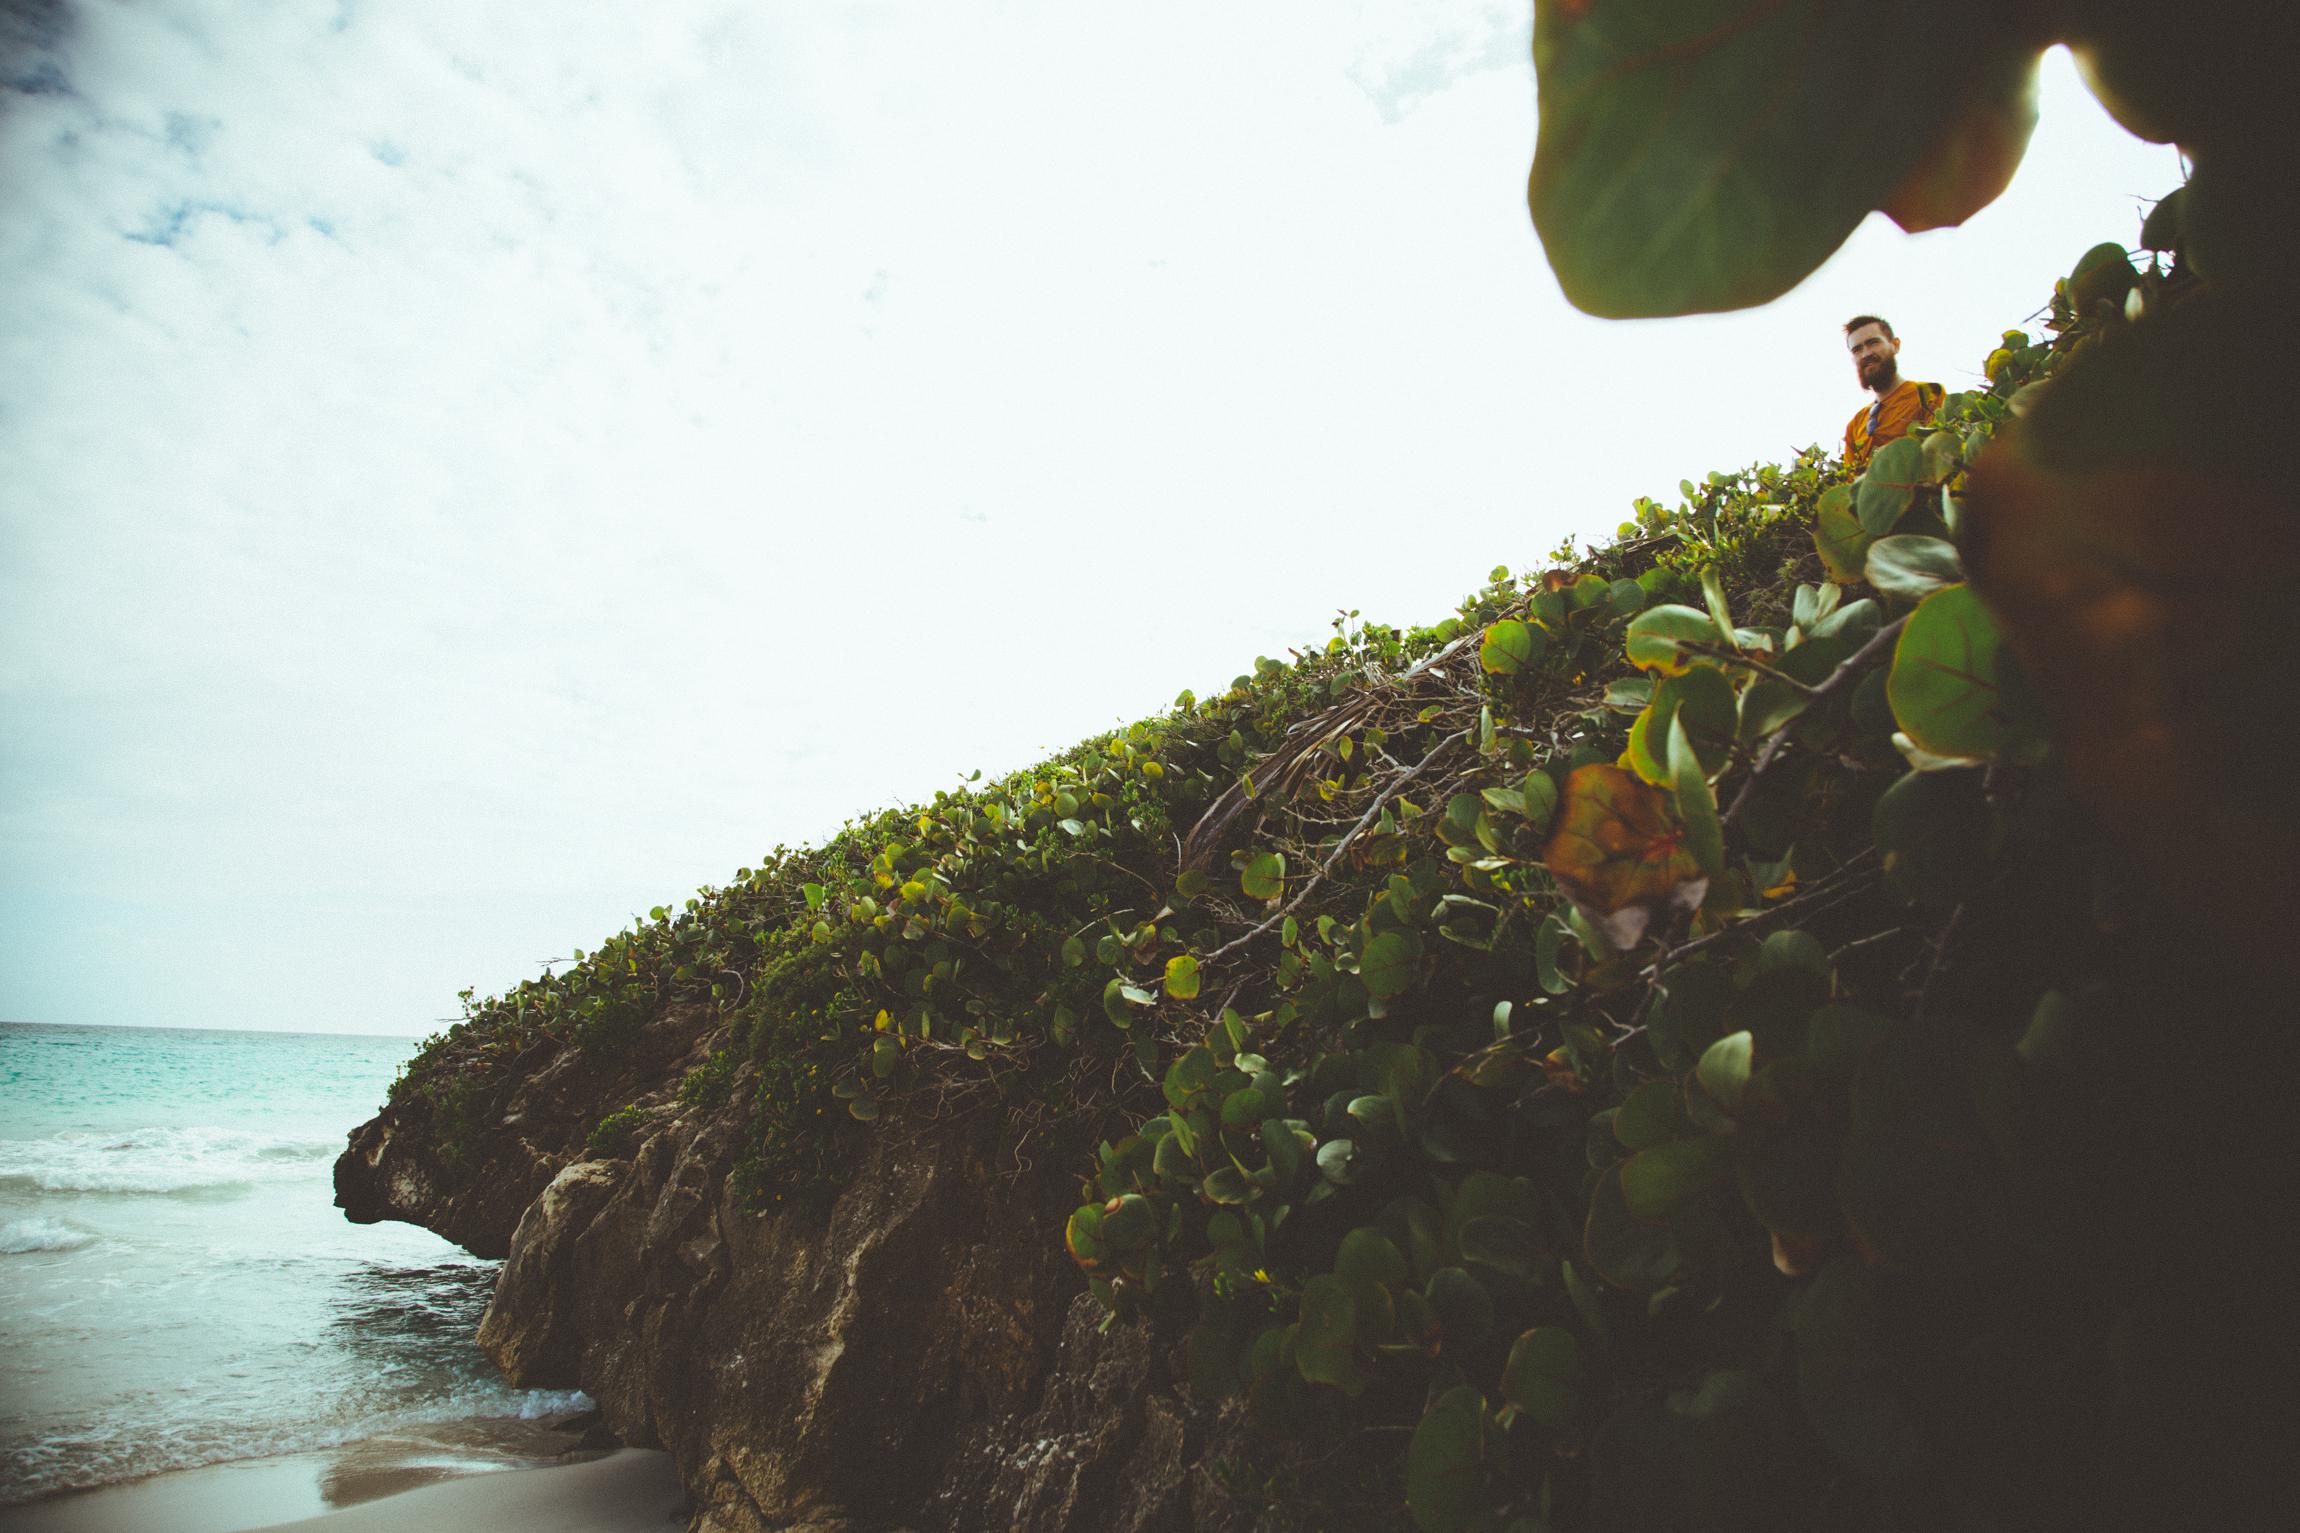 Puerto Rico Travel Photography